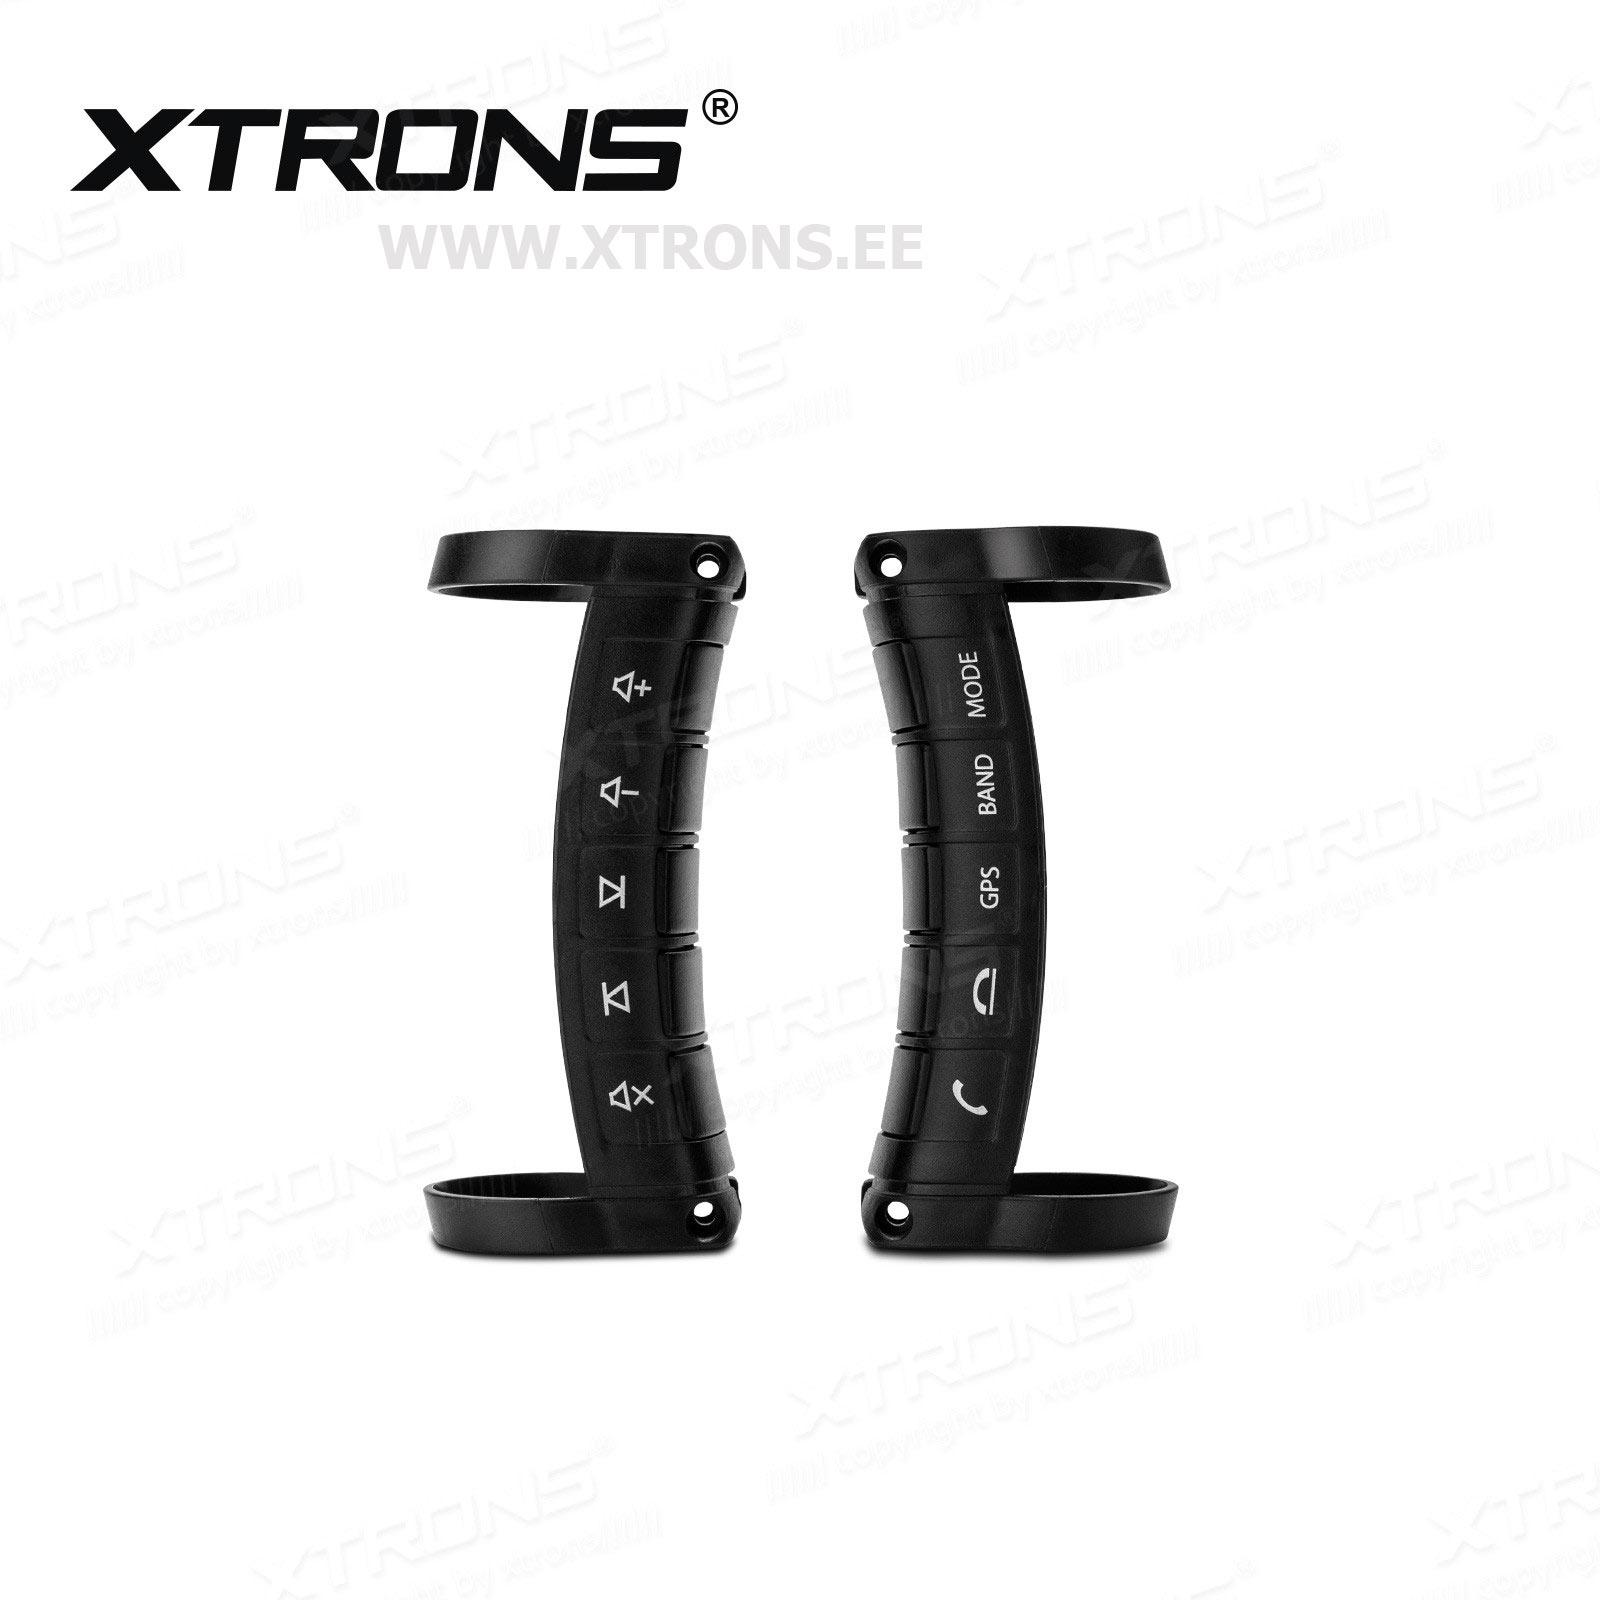 XTRONS SWC01